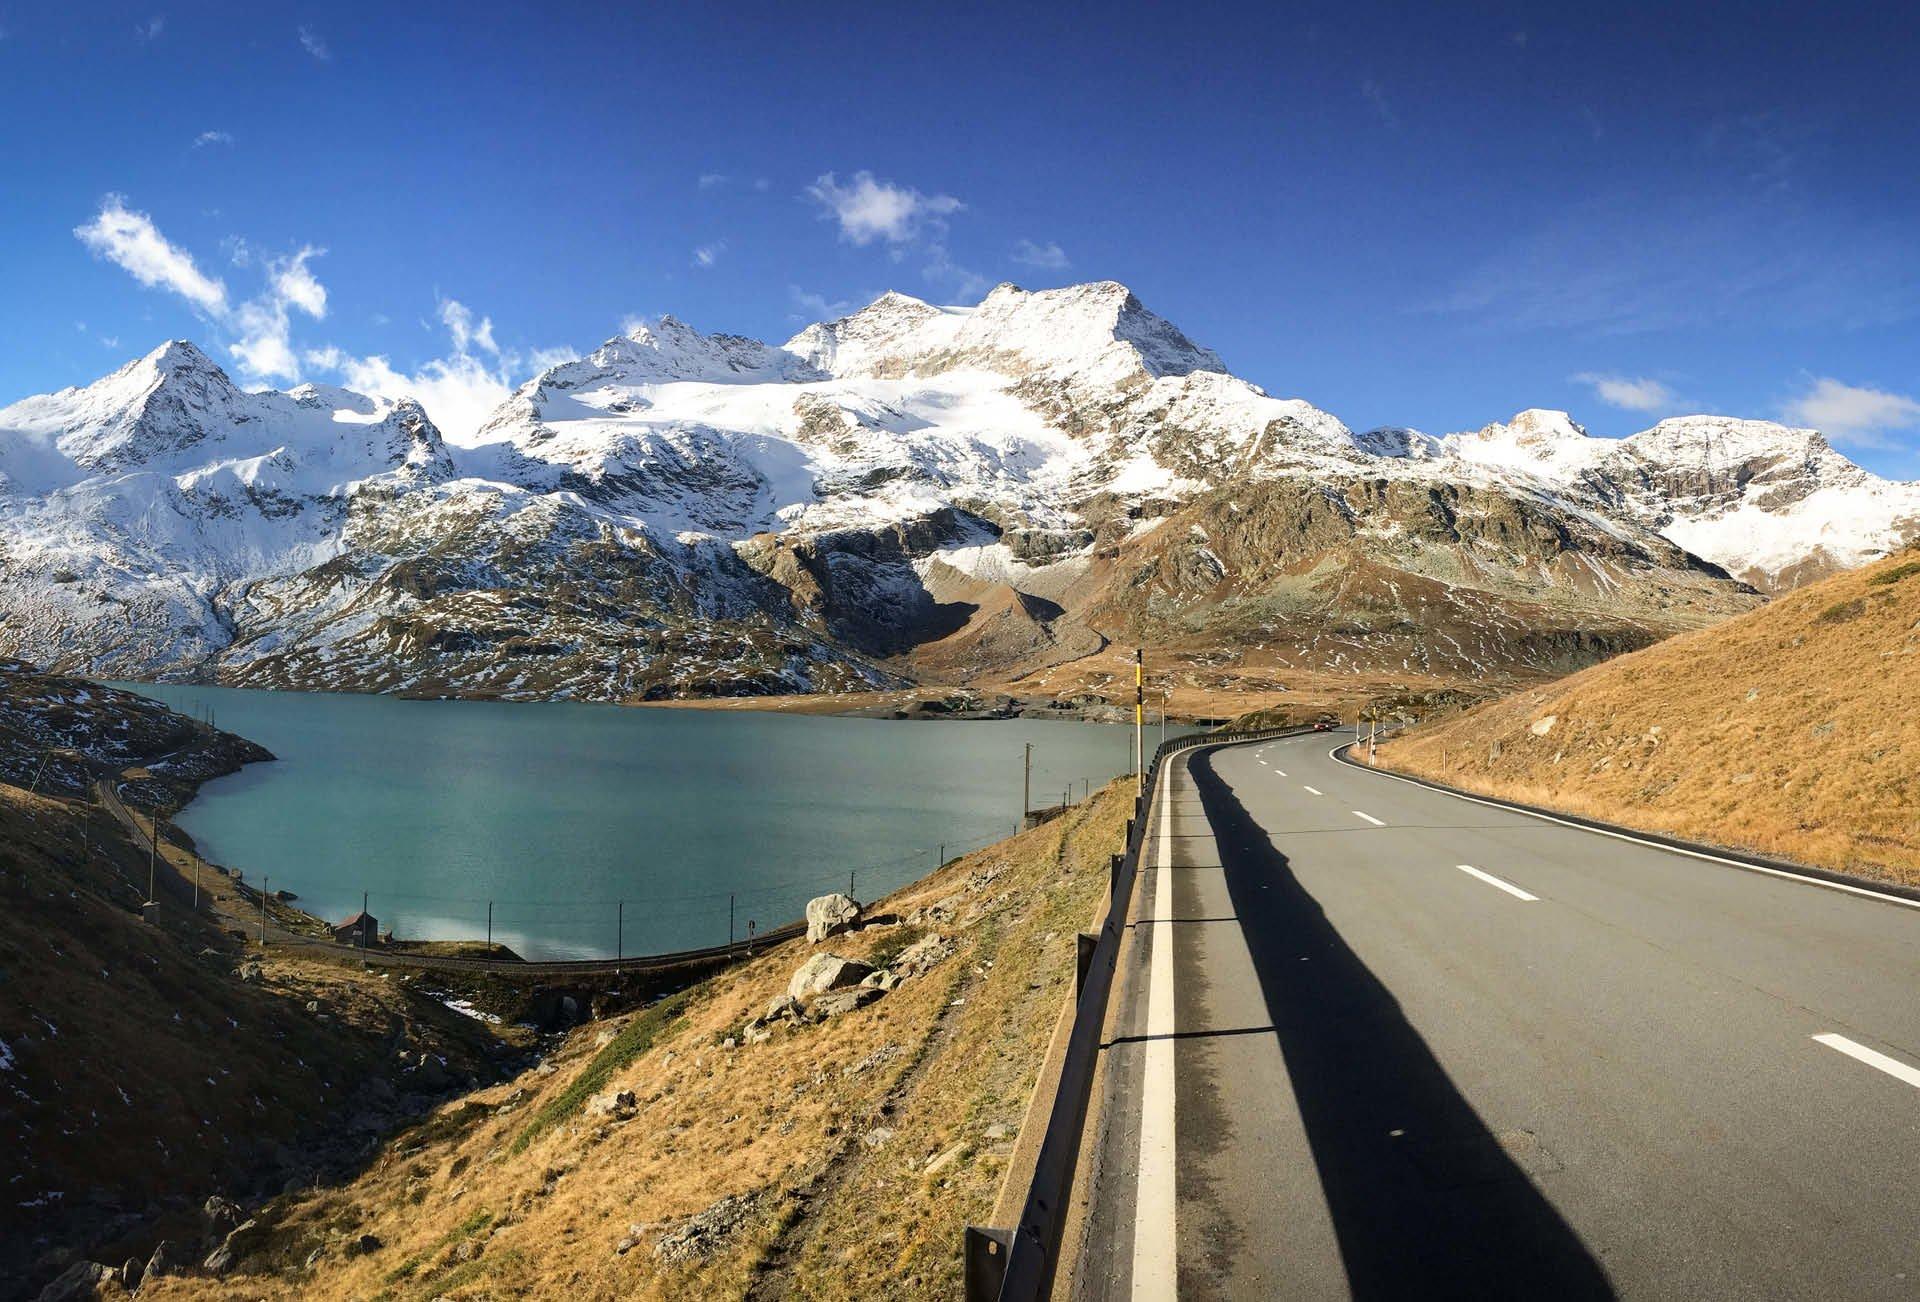 alpenradtour8.jpg